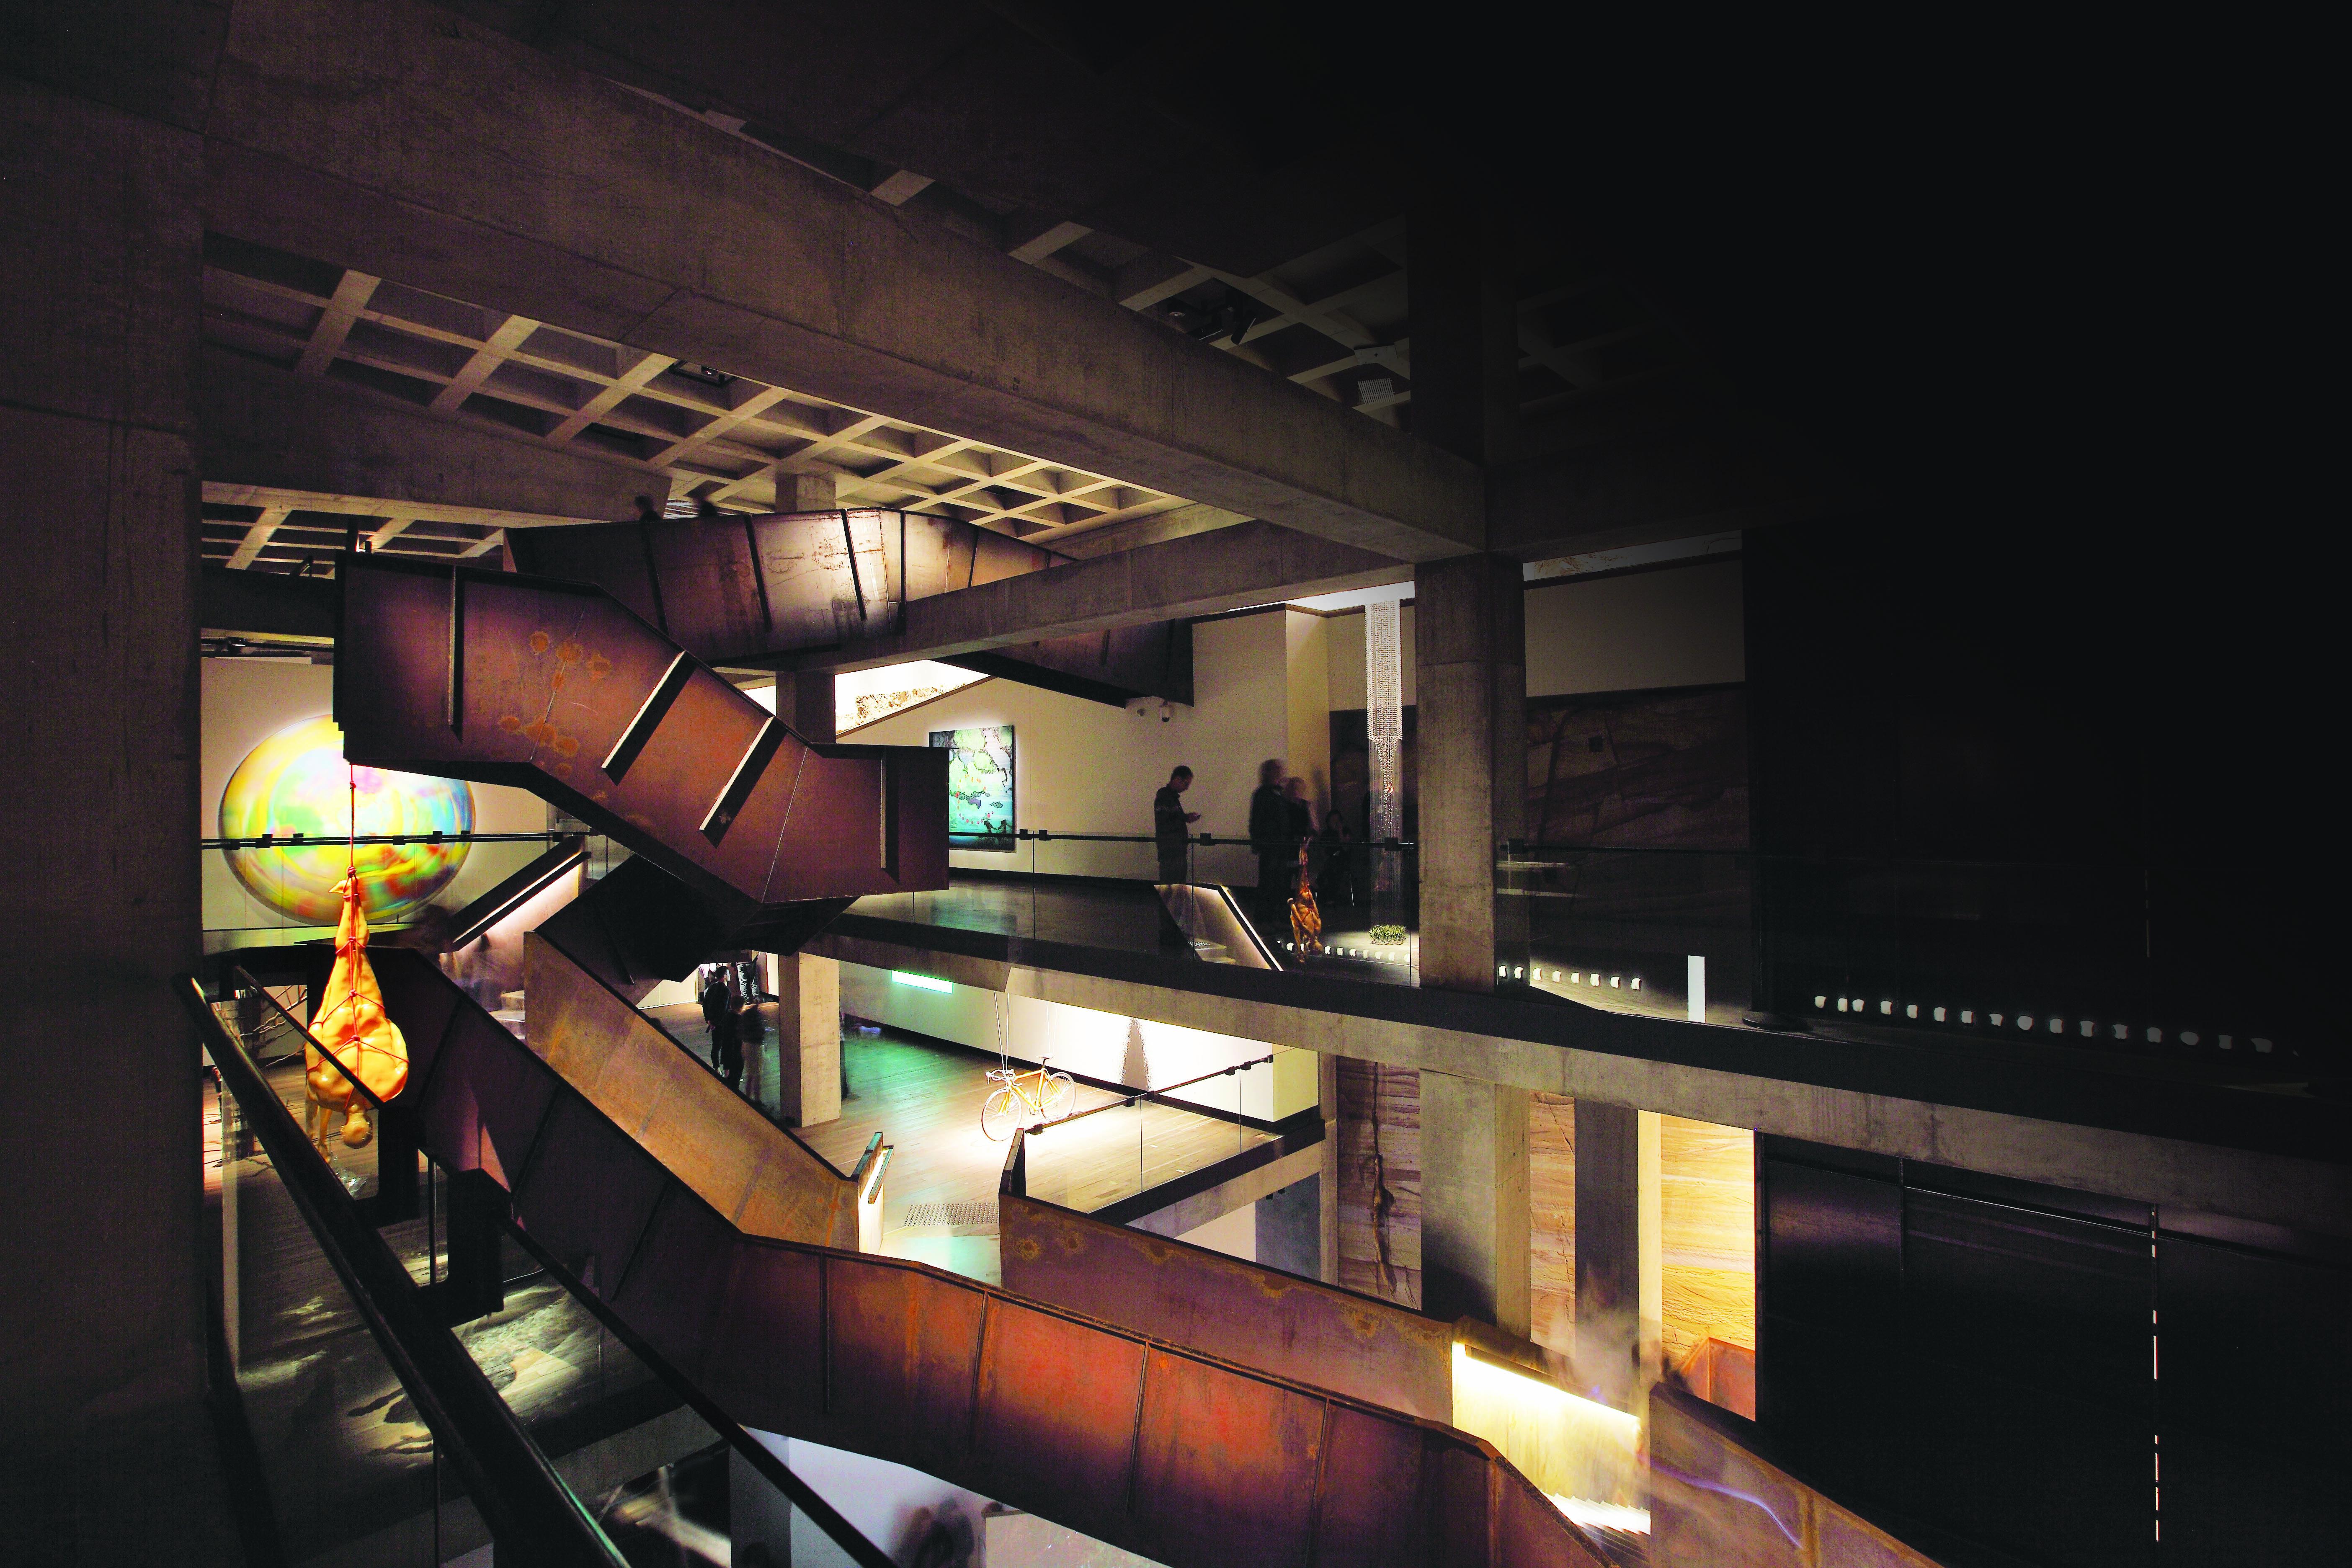 Corten Stairwell and surrounding artworks inside MONA, Hobart